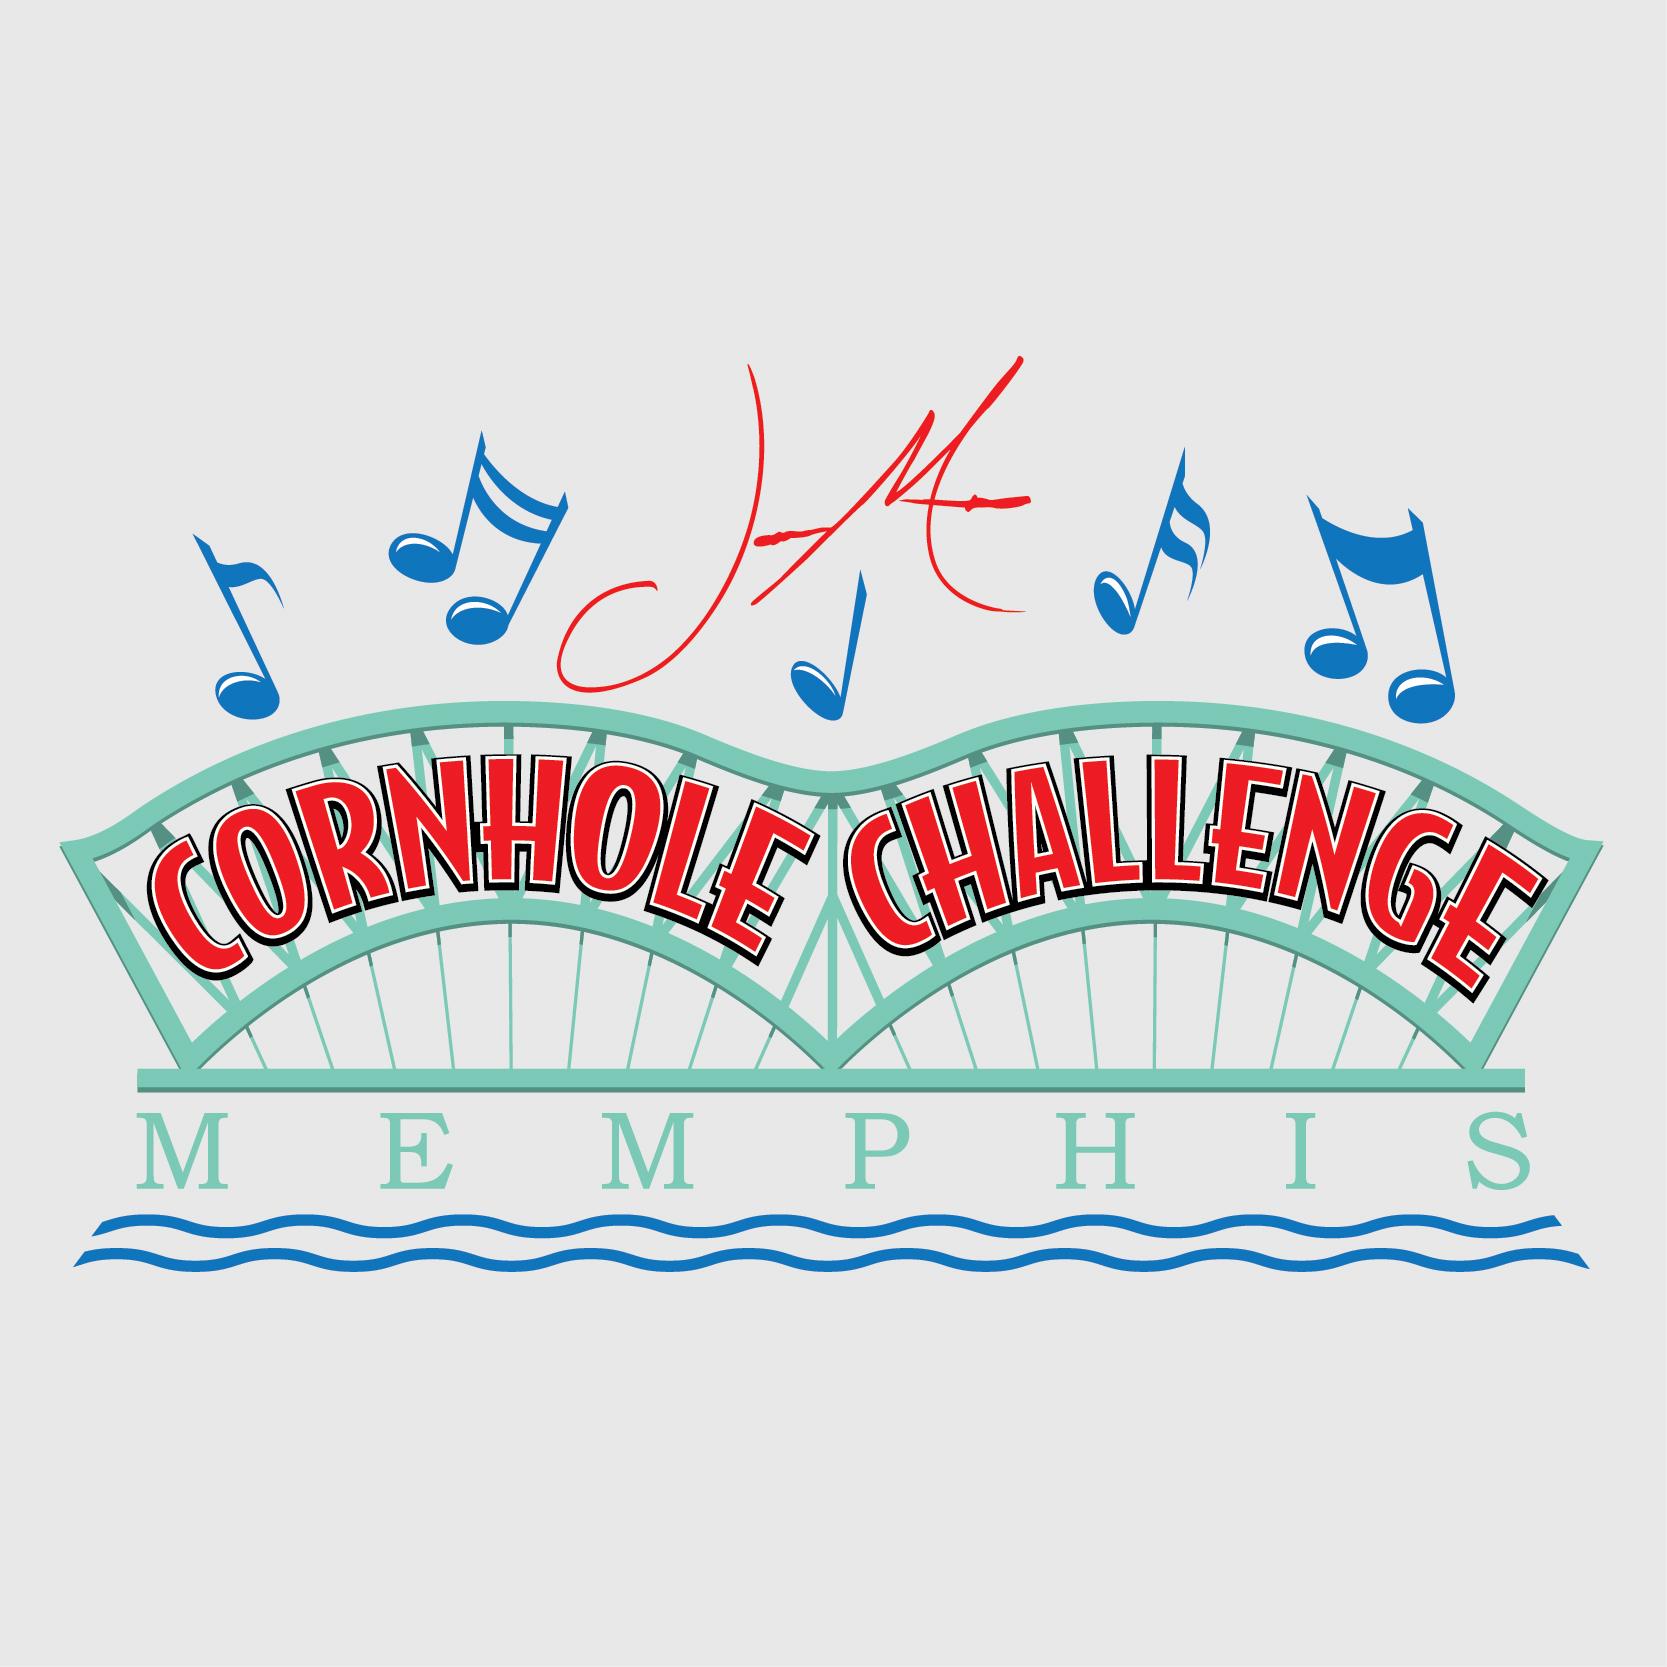 2017 Memphis Cornhole Challenge Logo